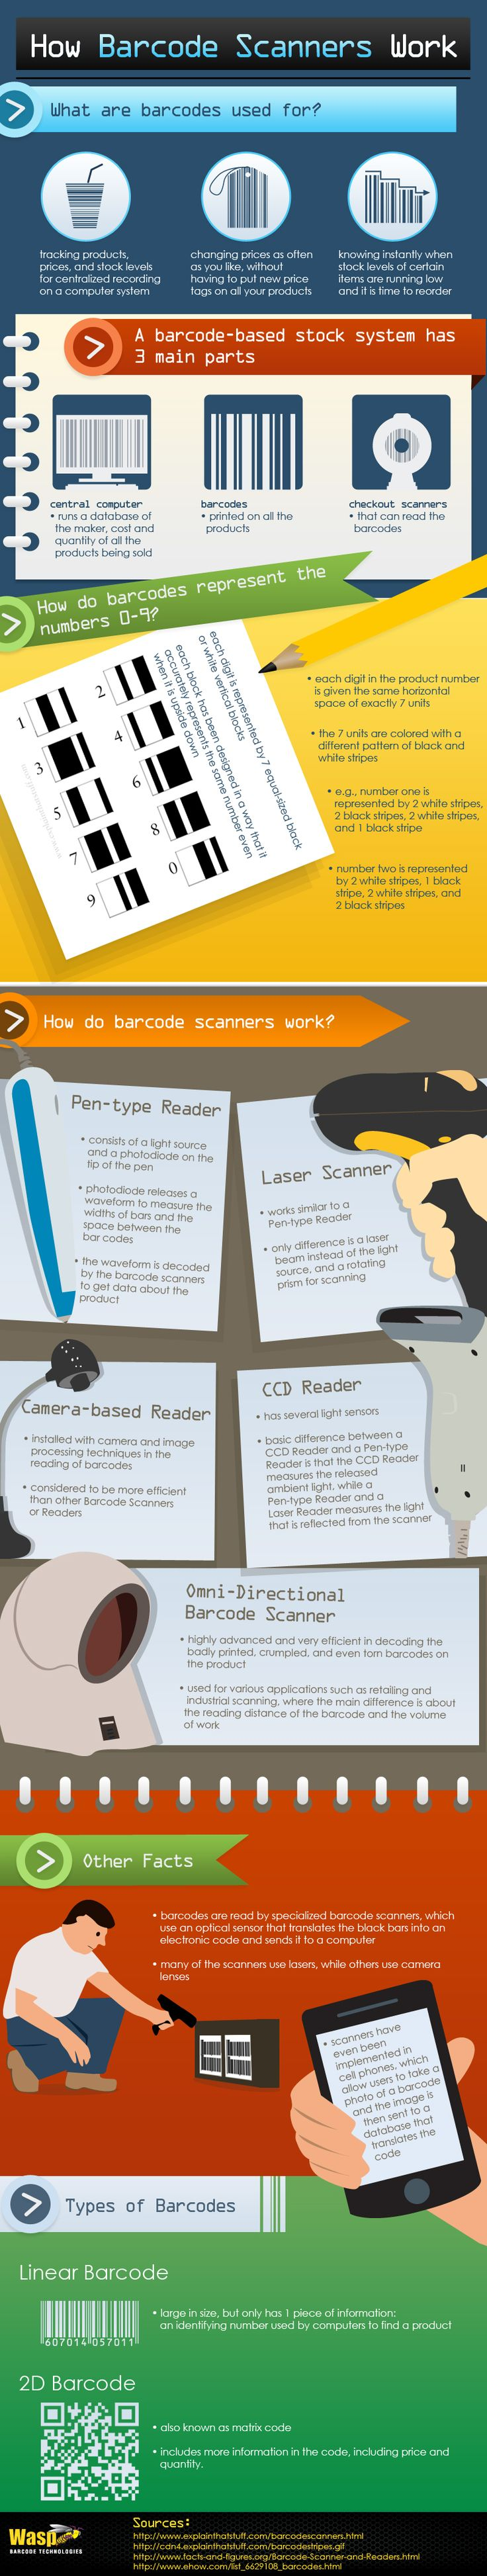 Cómo funciona un escáner de código de barras #infografia #infographic #curiosidades #tecnologia